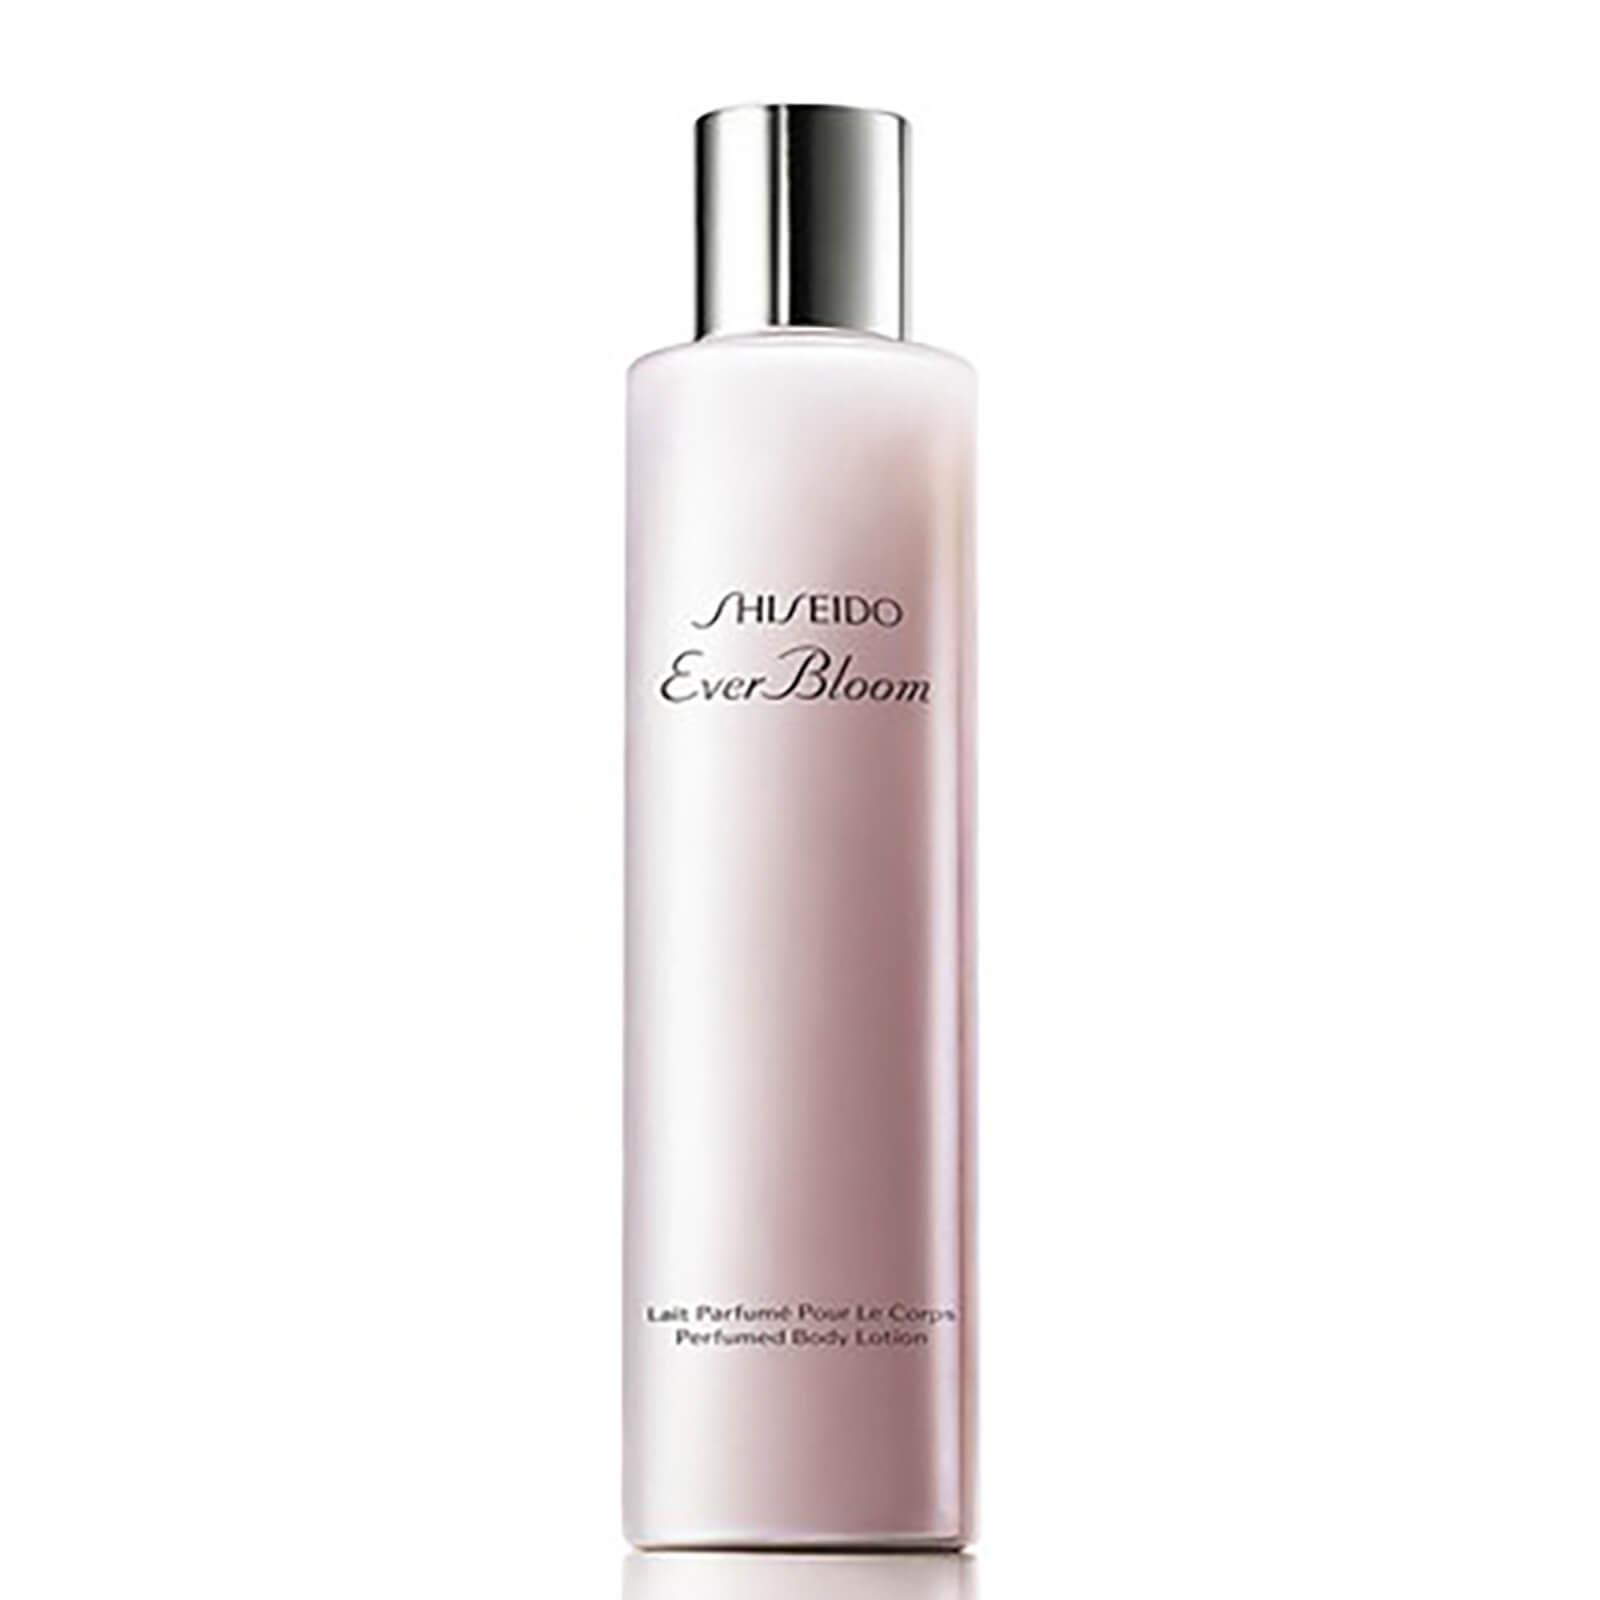 Shiseido Ever Bloom crema doccia (200 ml)